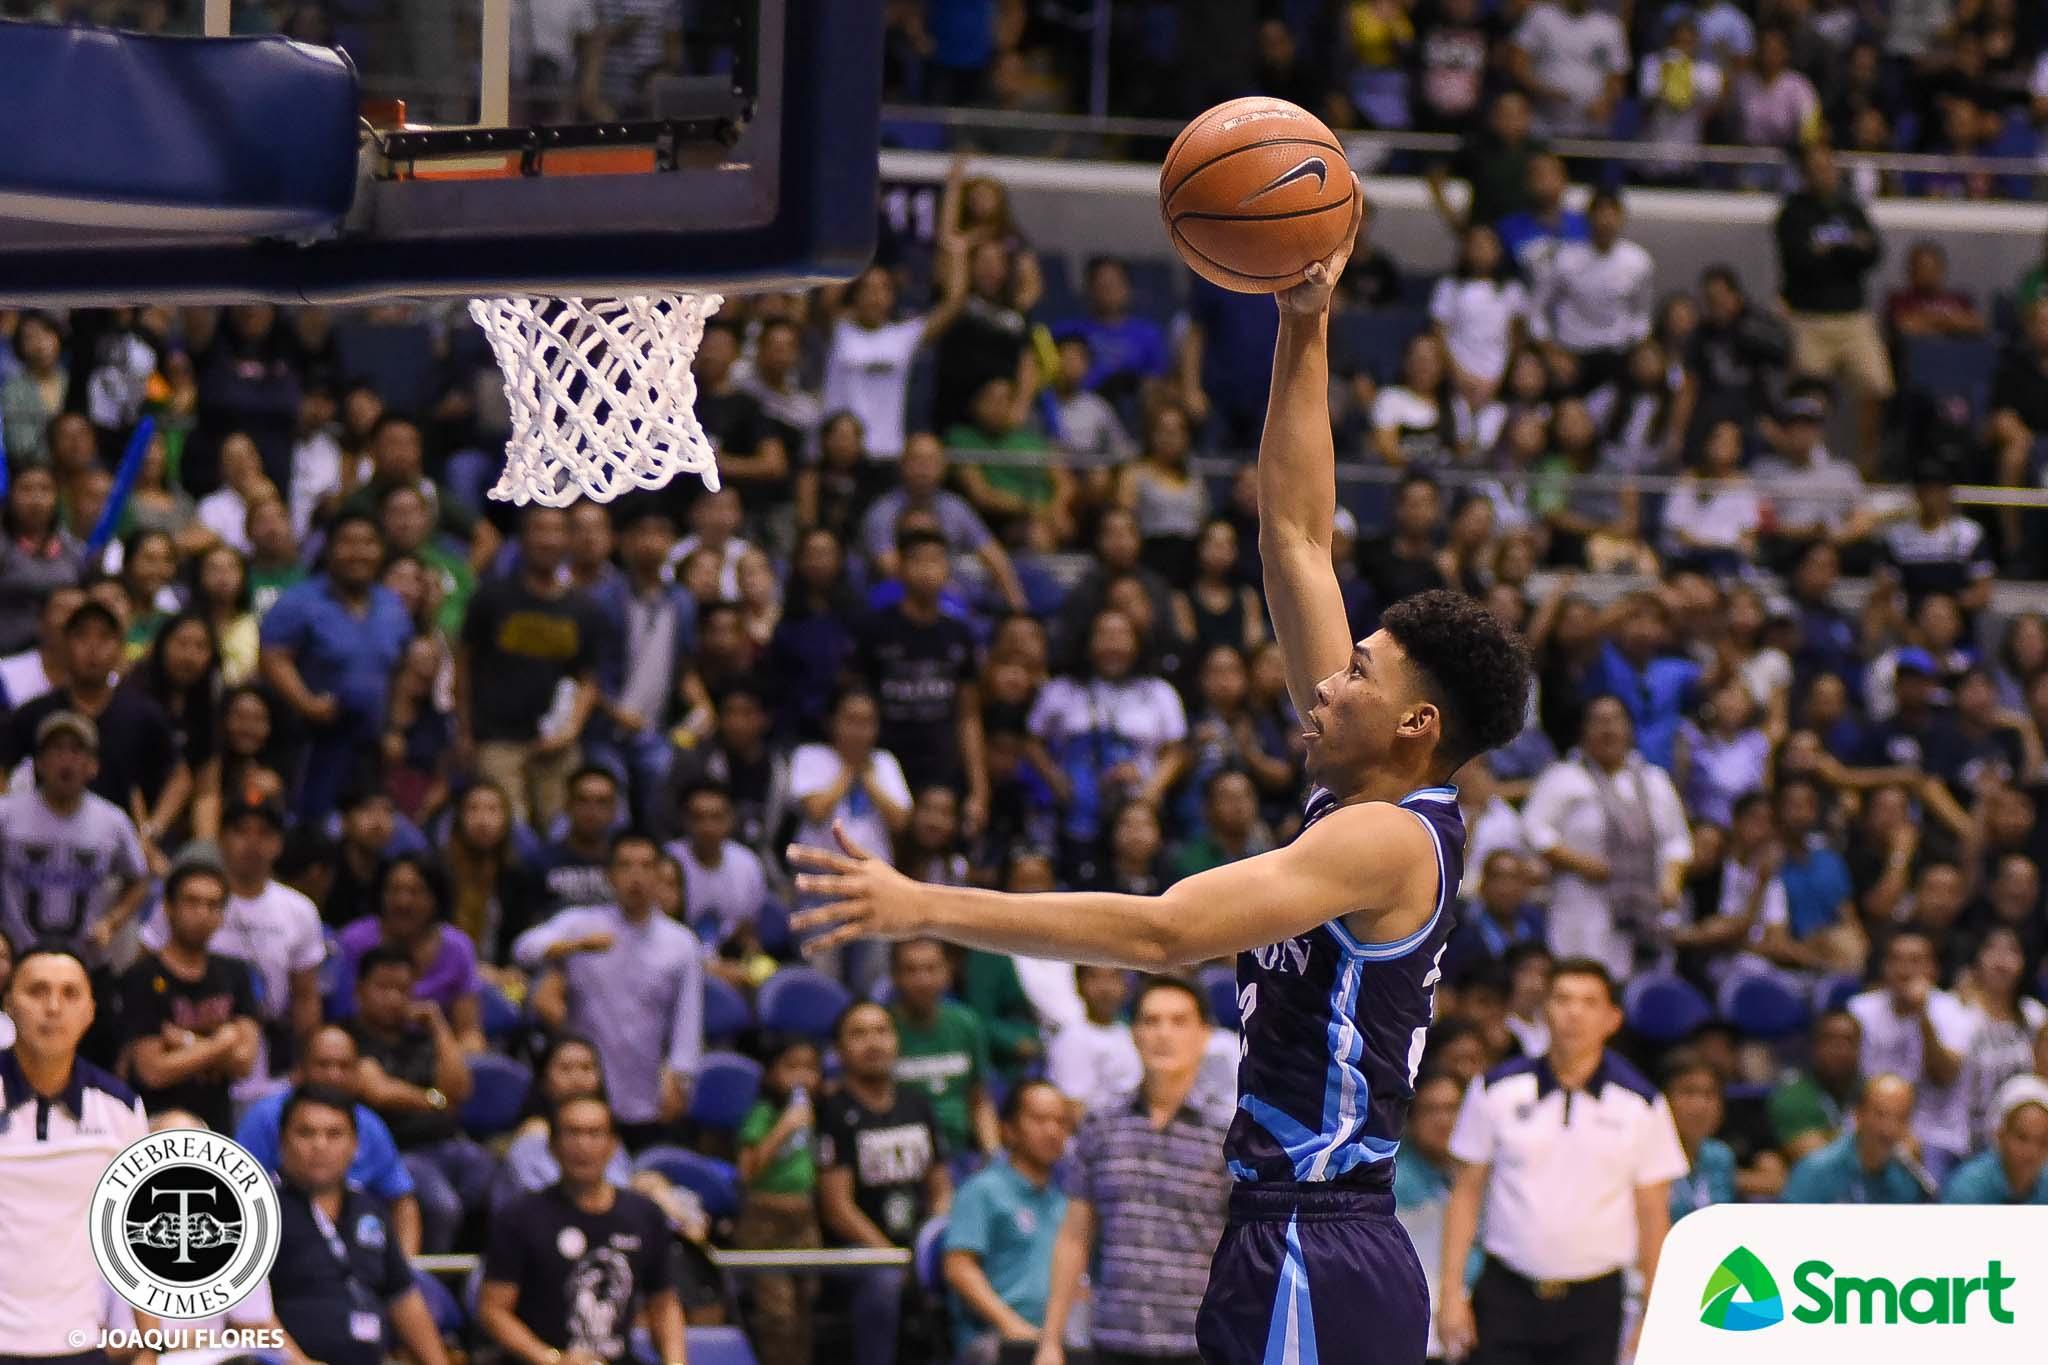 Philippine Sports News - Tiebreaker Times Rebo Saguisag sheds light on UAAP investigation of La Salle-Adamson tiff AdU Basketball DLSU News UAAP  UAAP Season 80 Men's Basketball UAAP Season 80 Rebo Saguisag DLSU Men's Basketball Adamson Men's Basketball